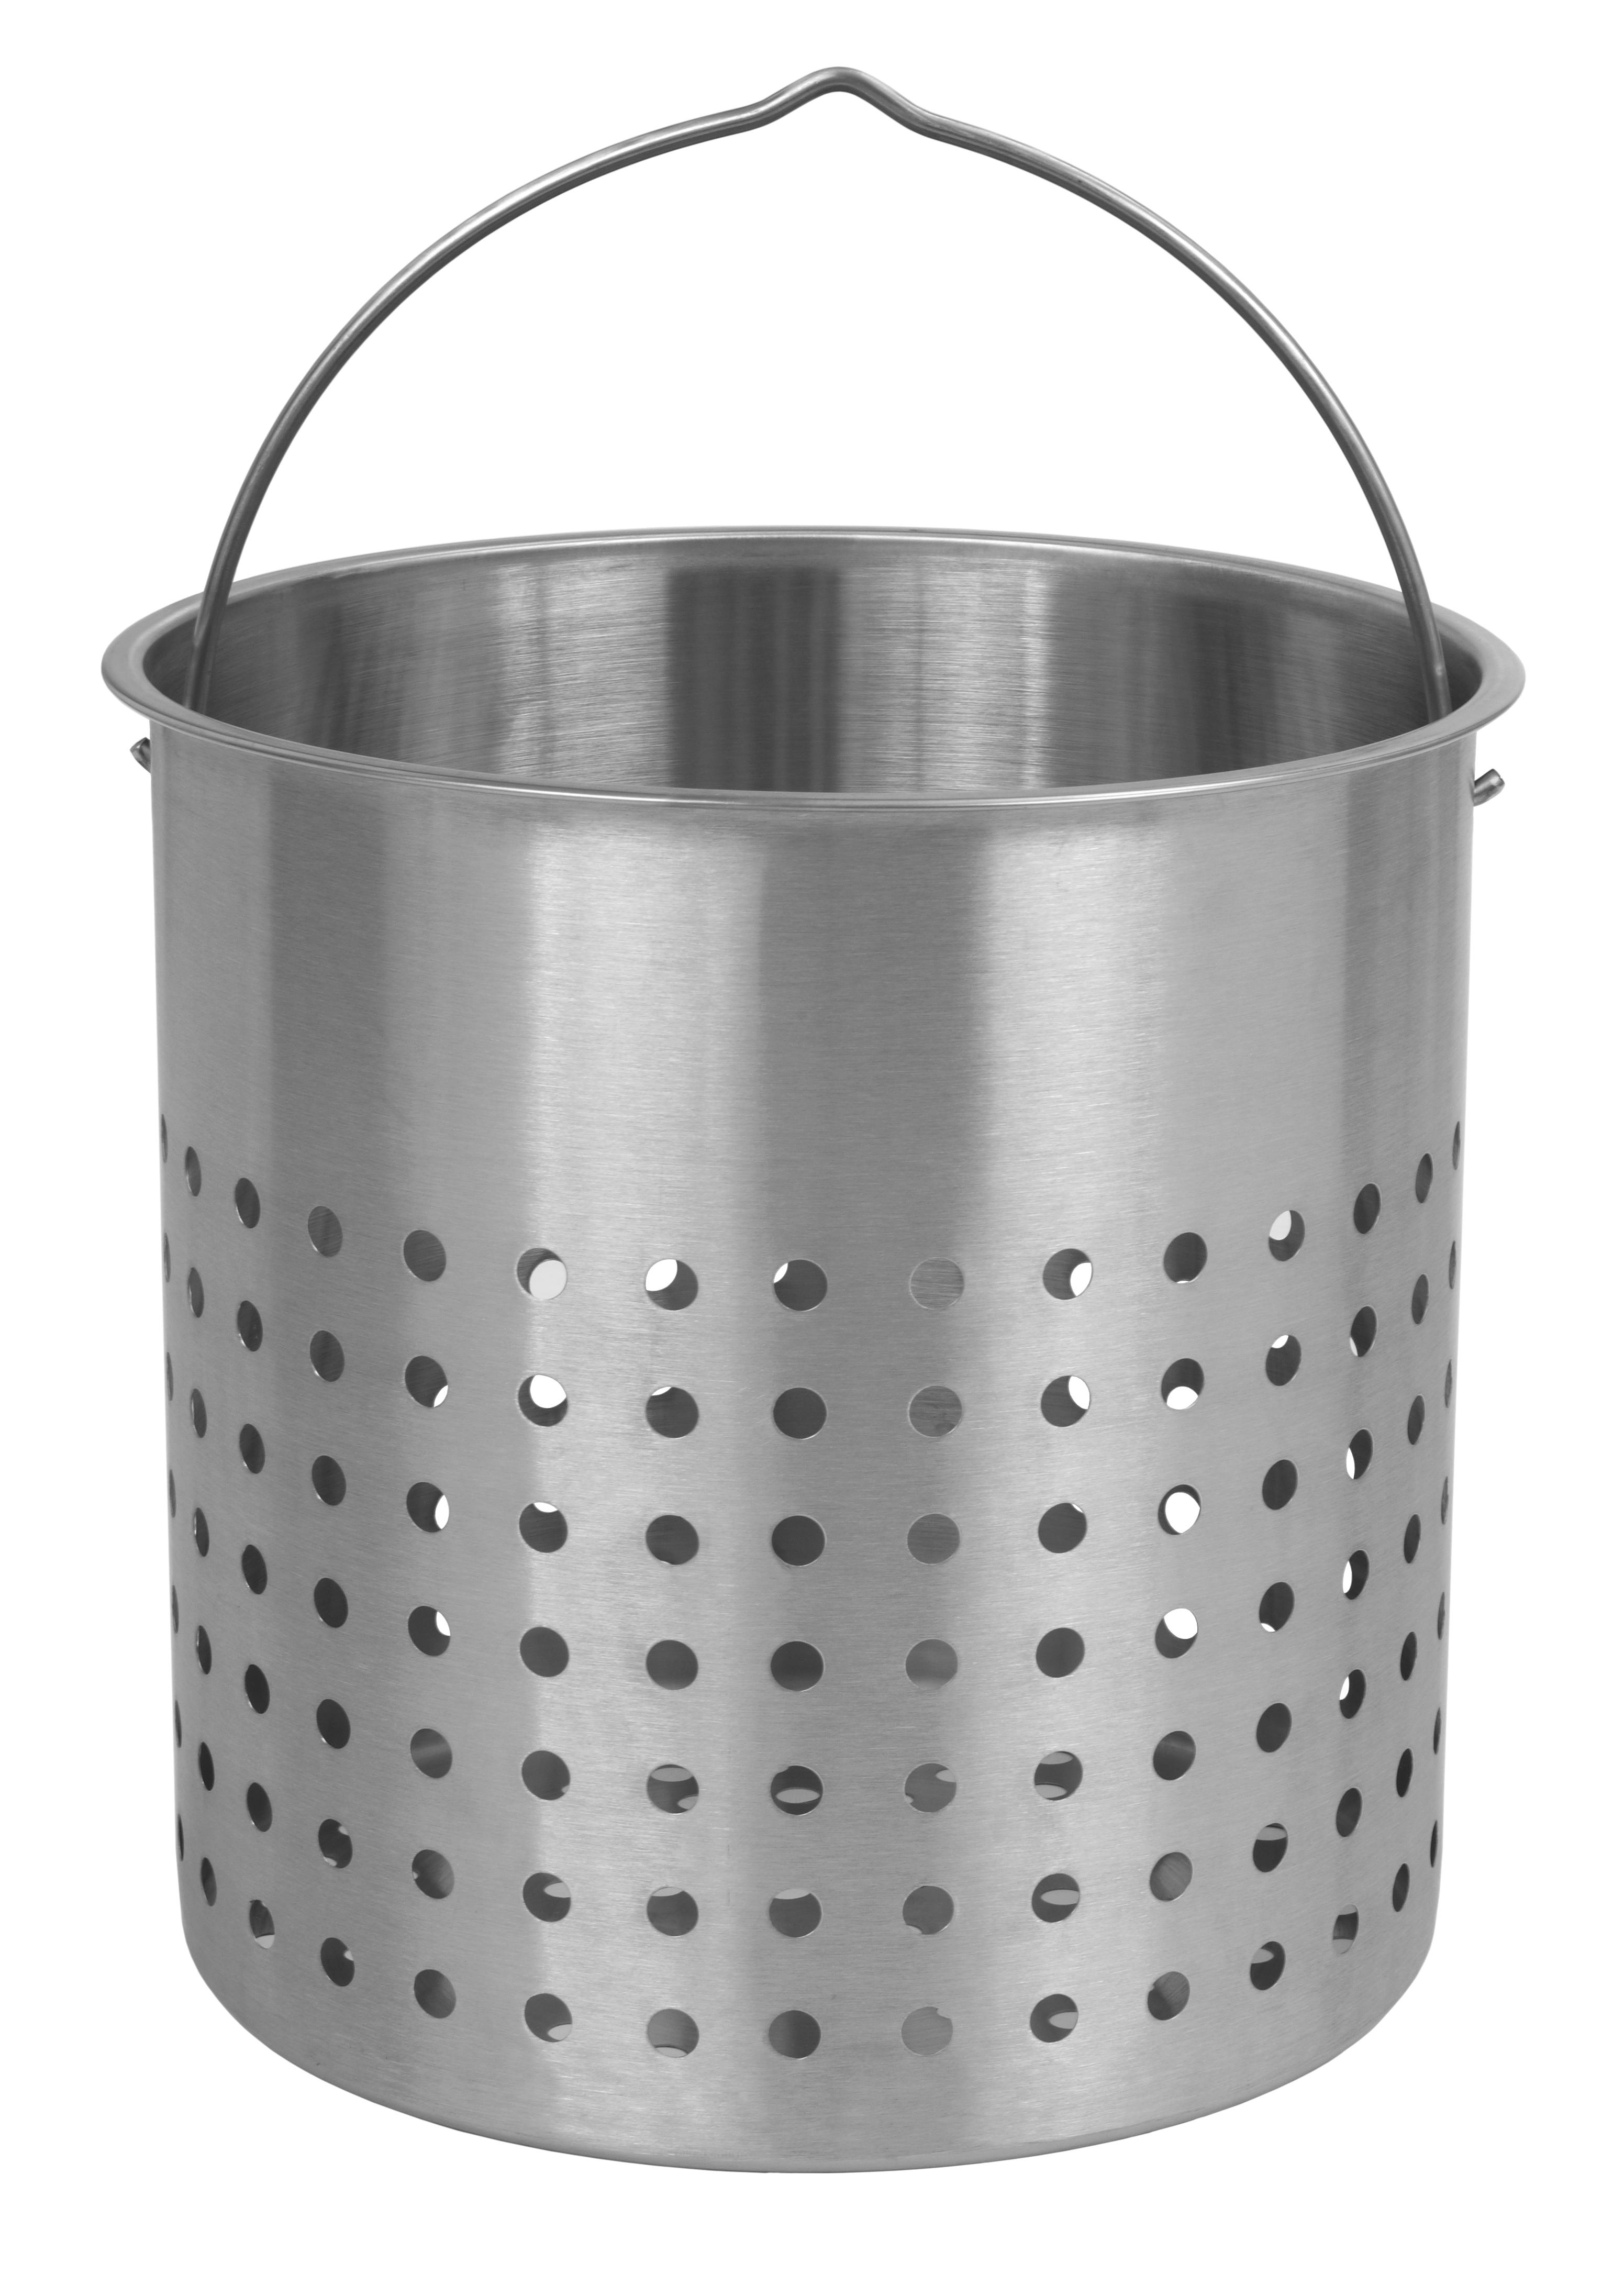 Bayou Classic B144 44-Qt. Perforated Basket